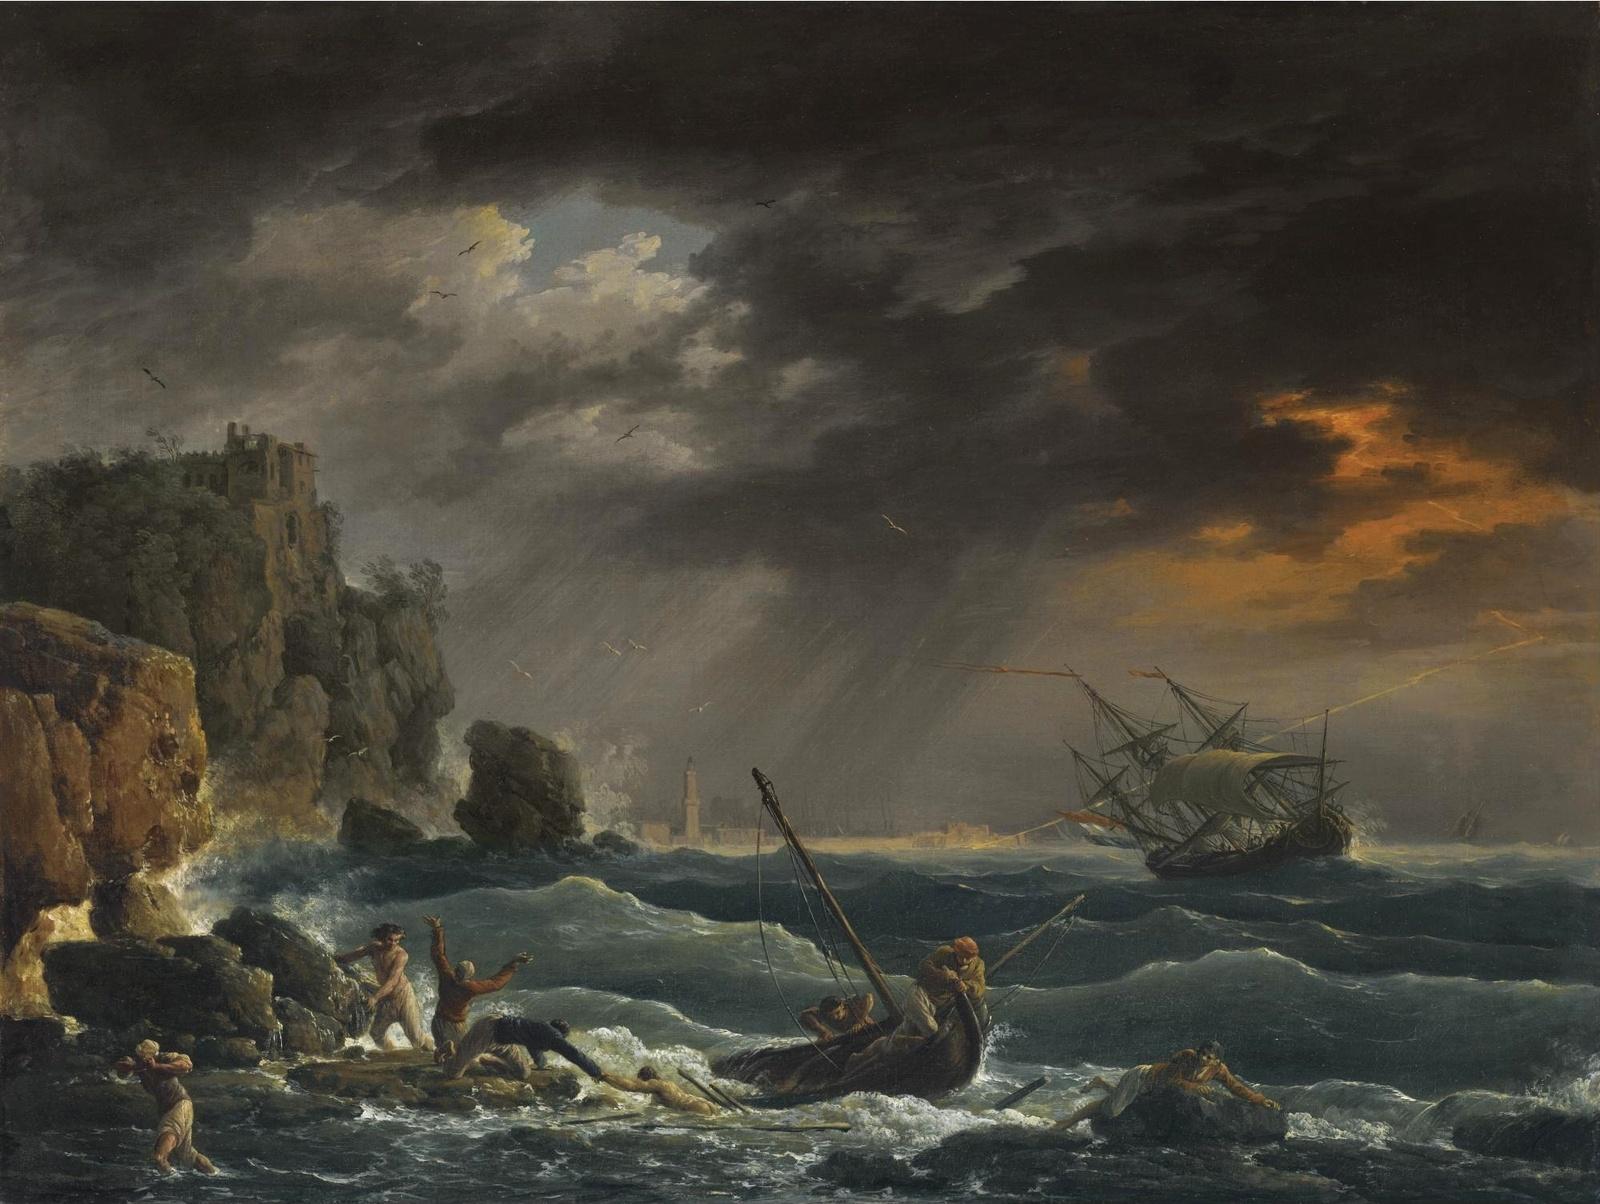 claude joseph vernets shipwreck Claude joseph vernet, shipwreck, 1763, oil on canvas, 102 x 126 cm, the hermitage vernet, claude joseph vigée lebrun, elisabeth winterhalter, franz xavier.